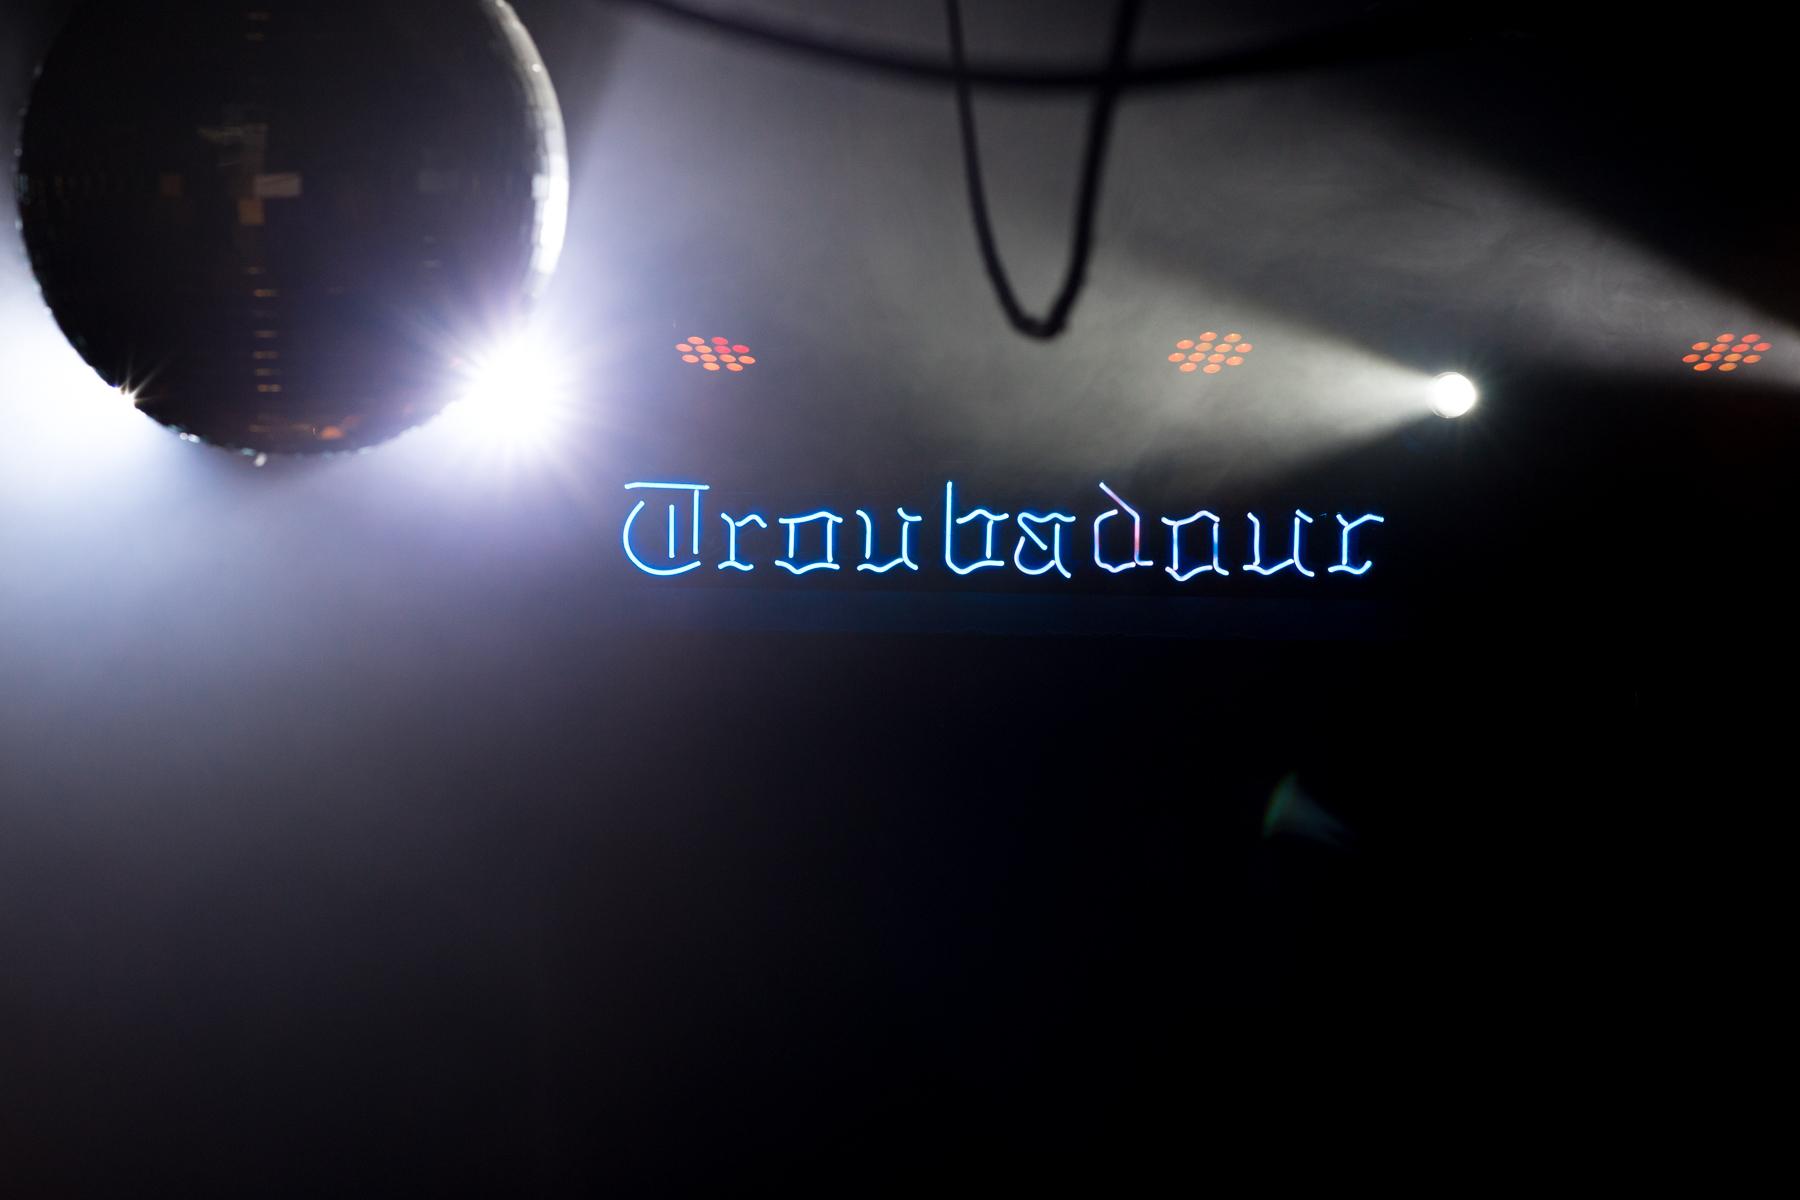 Noah-Trubadour-Rob-Kalmbach-1.jpg